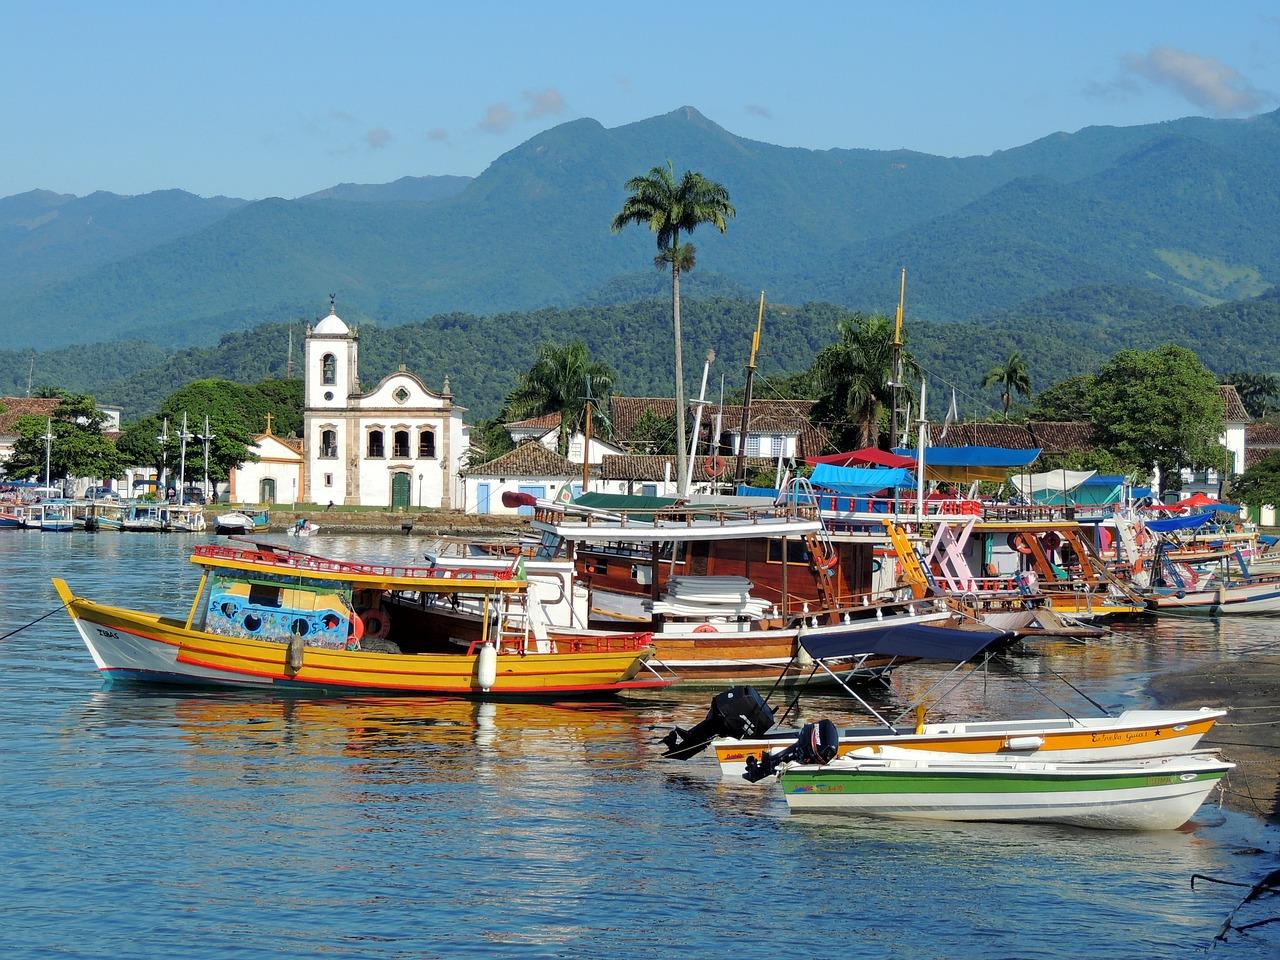 Paraty - Rio de Janeiro - Brésil aventure - Carnet de voyage de Rio à Ilha Grande